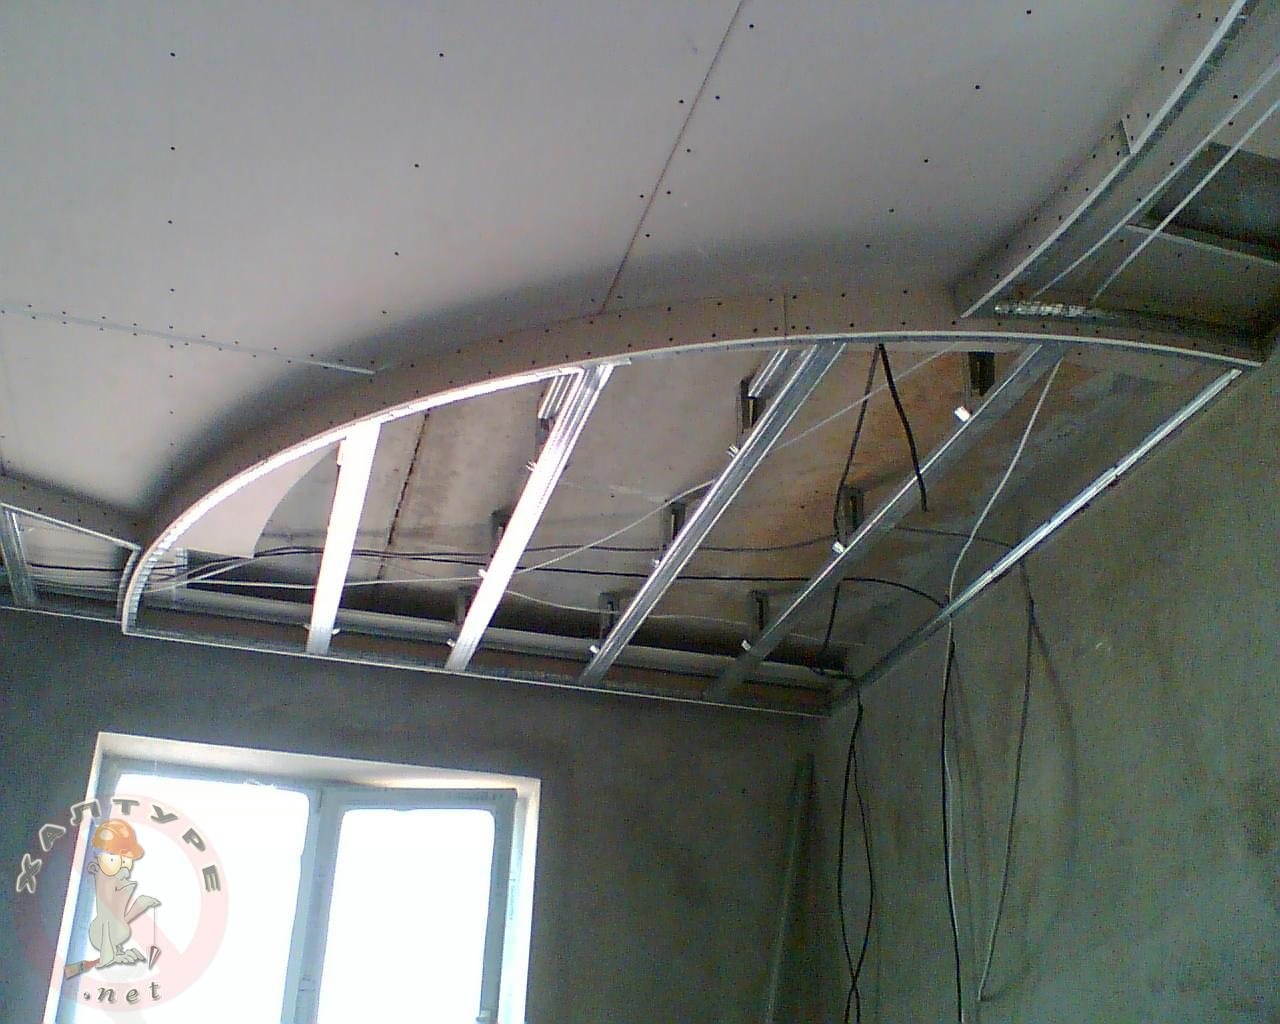 Монтаж потолка из гипсокартона своими руками фото